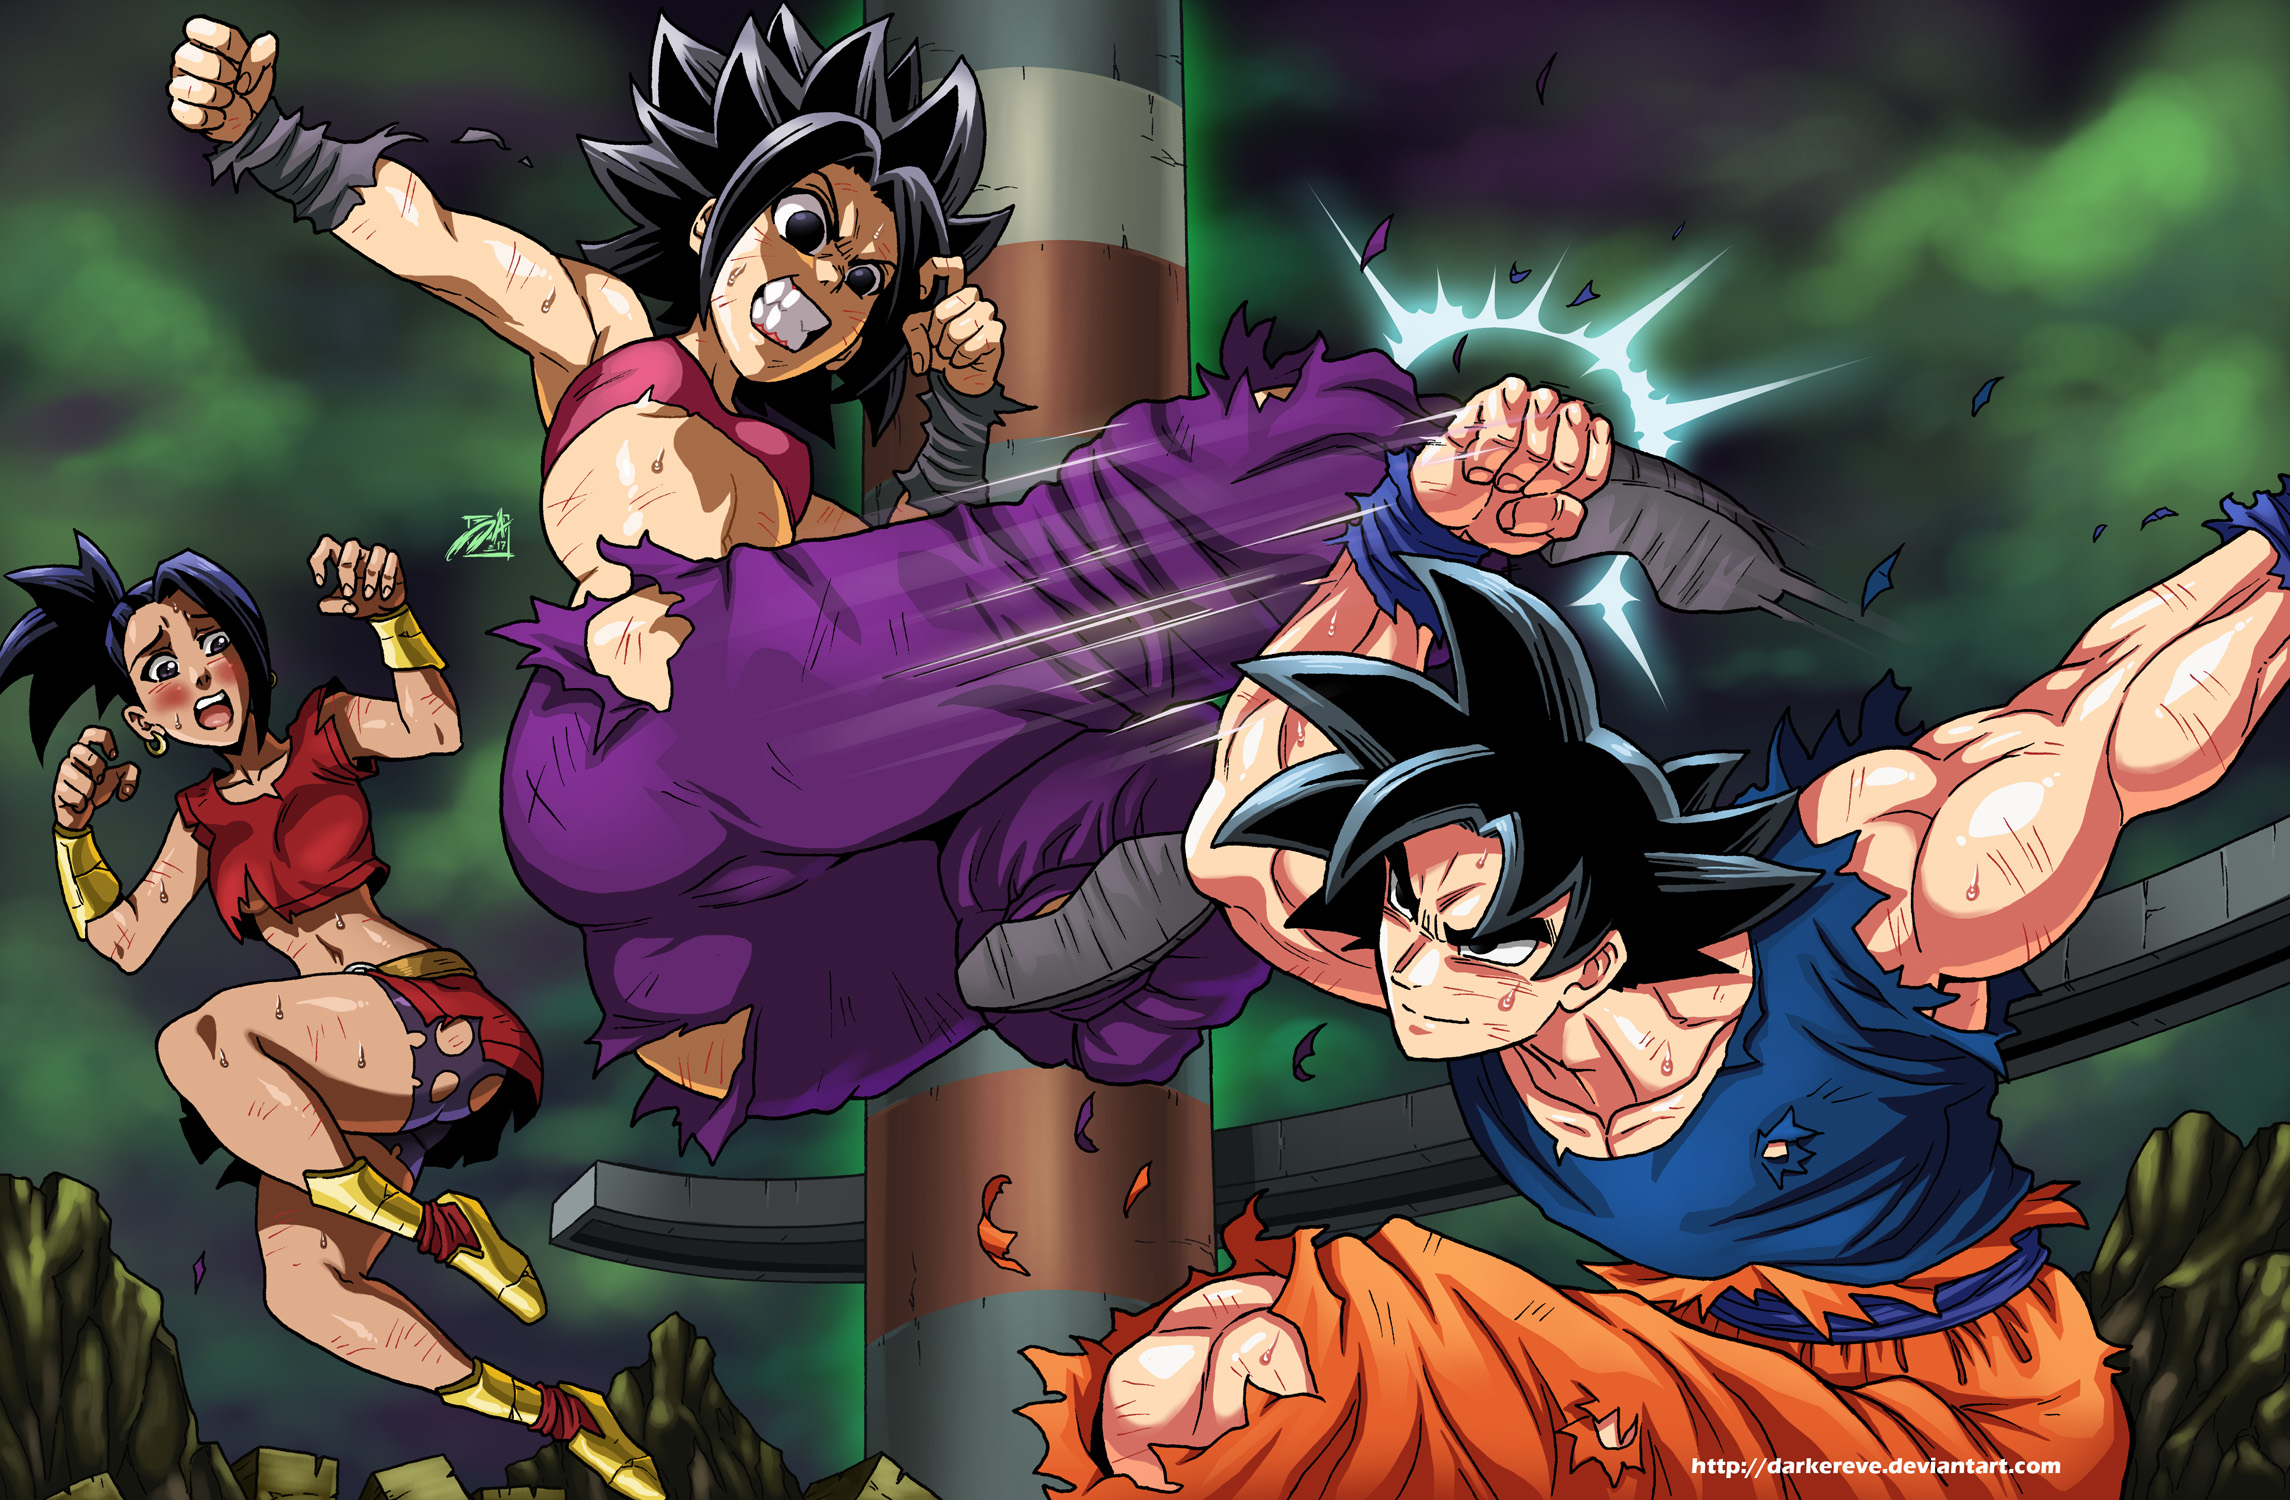 Caulifla Vs Goku By DarkerEve On DeviantArt